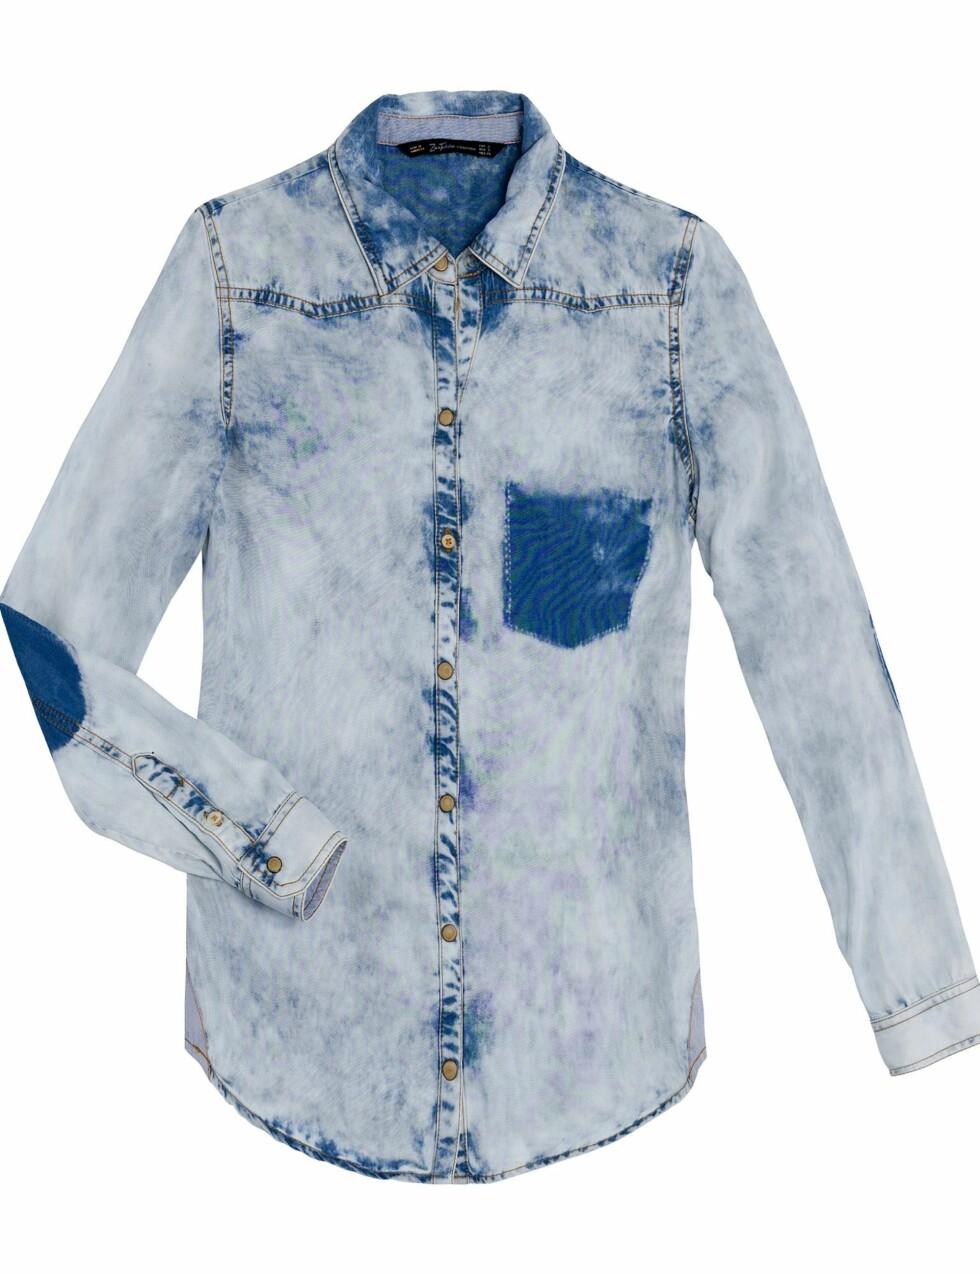 Kul denimskjorte i syrevask (300 kroner, Zara).  Foto: Produsenten